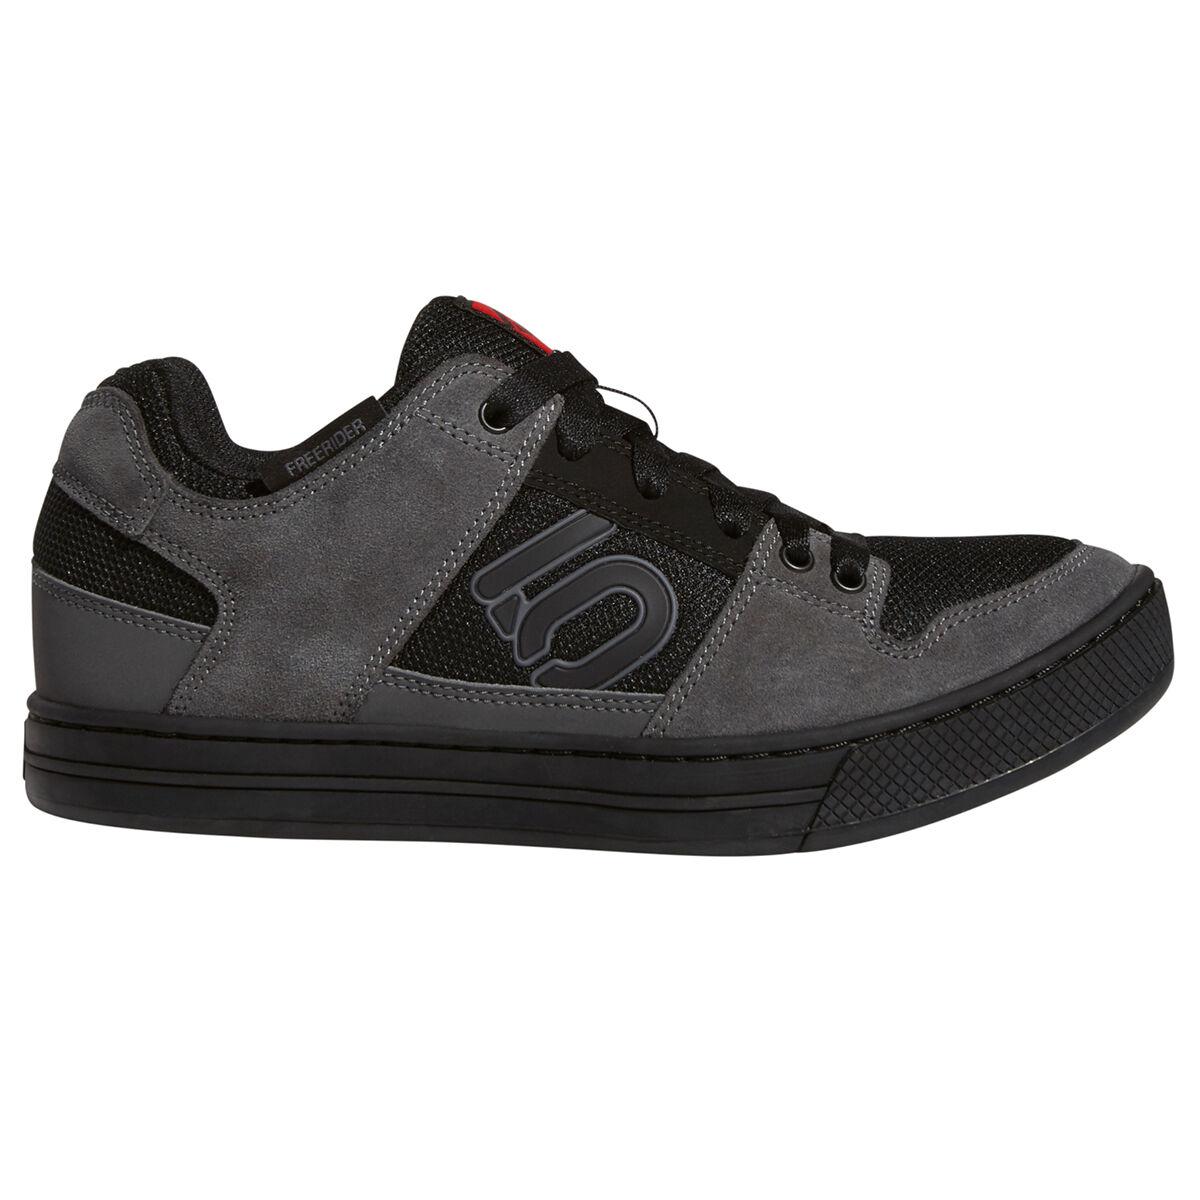 FIVE.TEN Five. ten Men's Freerider Mountain Bike Shoes - Size 8.5